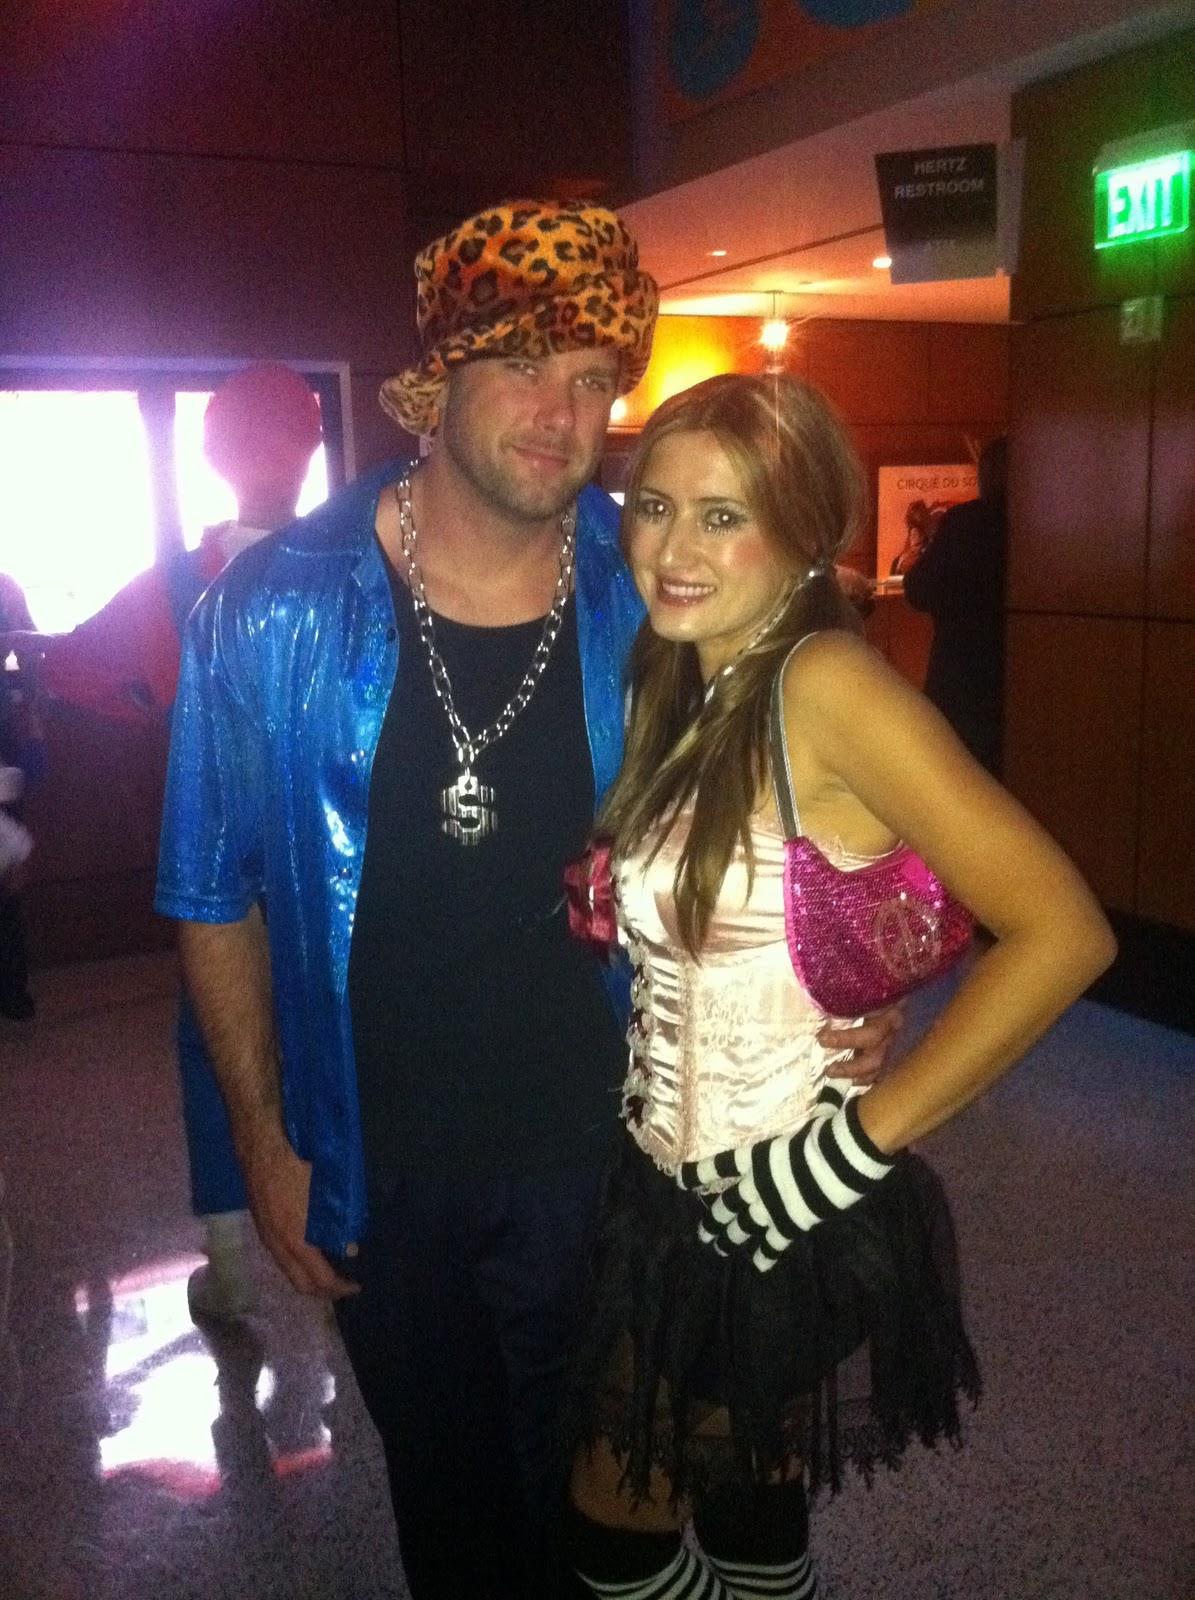 http://4.bp.blogspot.com/-rb0OHs59gOE/Tq7KHzl39bI/AAAAAAAAAWo/Bq9FRV-mgOM/s1600/HalloweenJeffNaibeGood.jpg